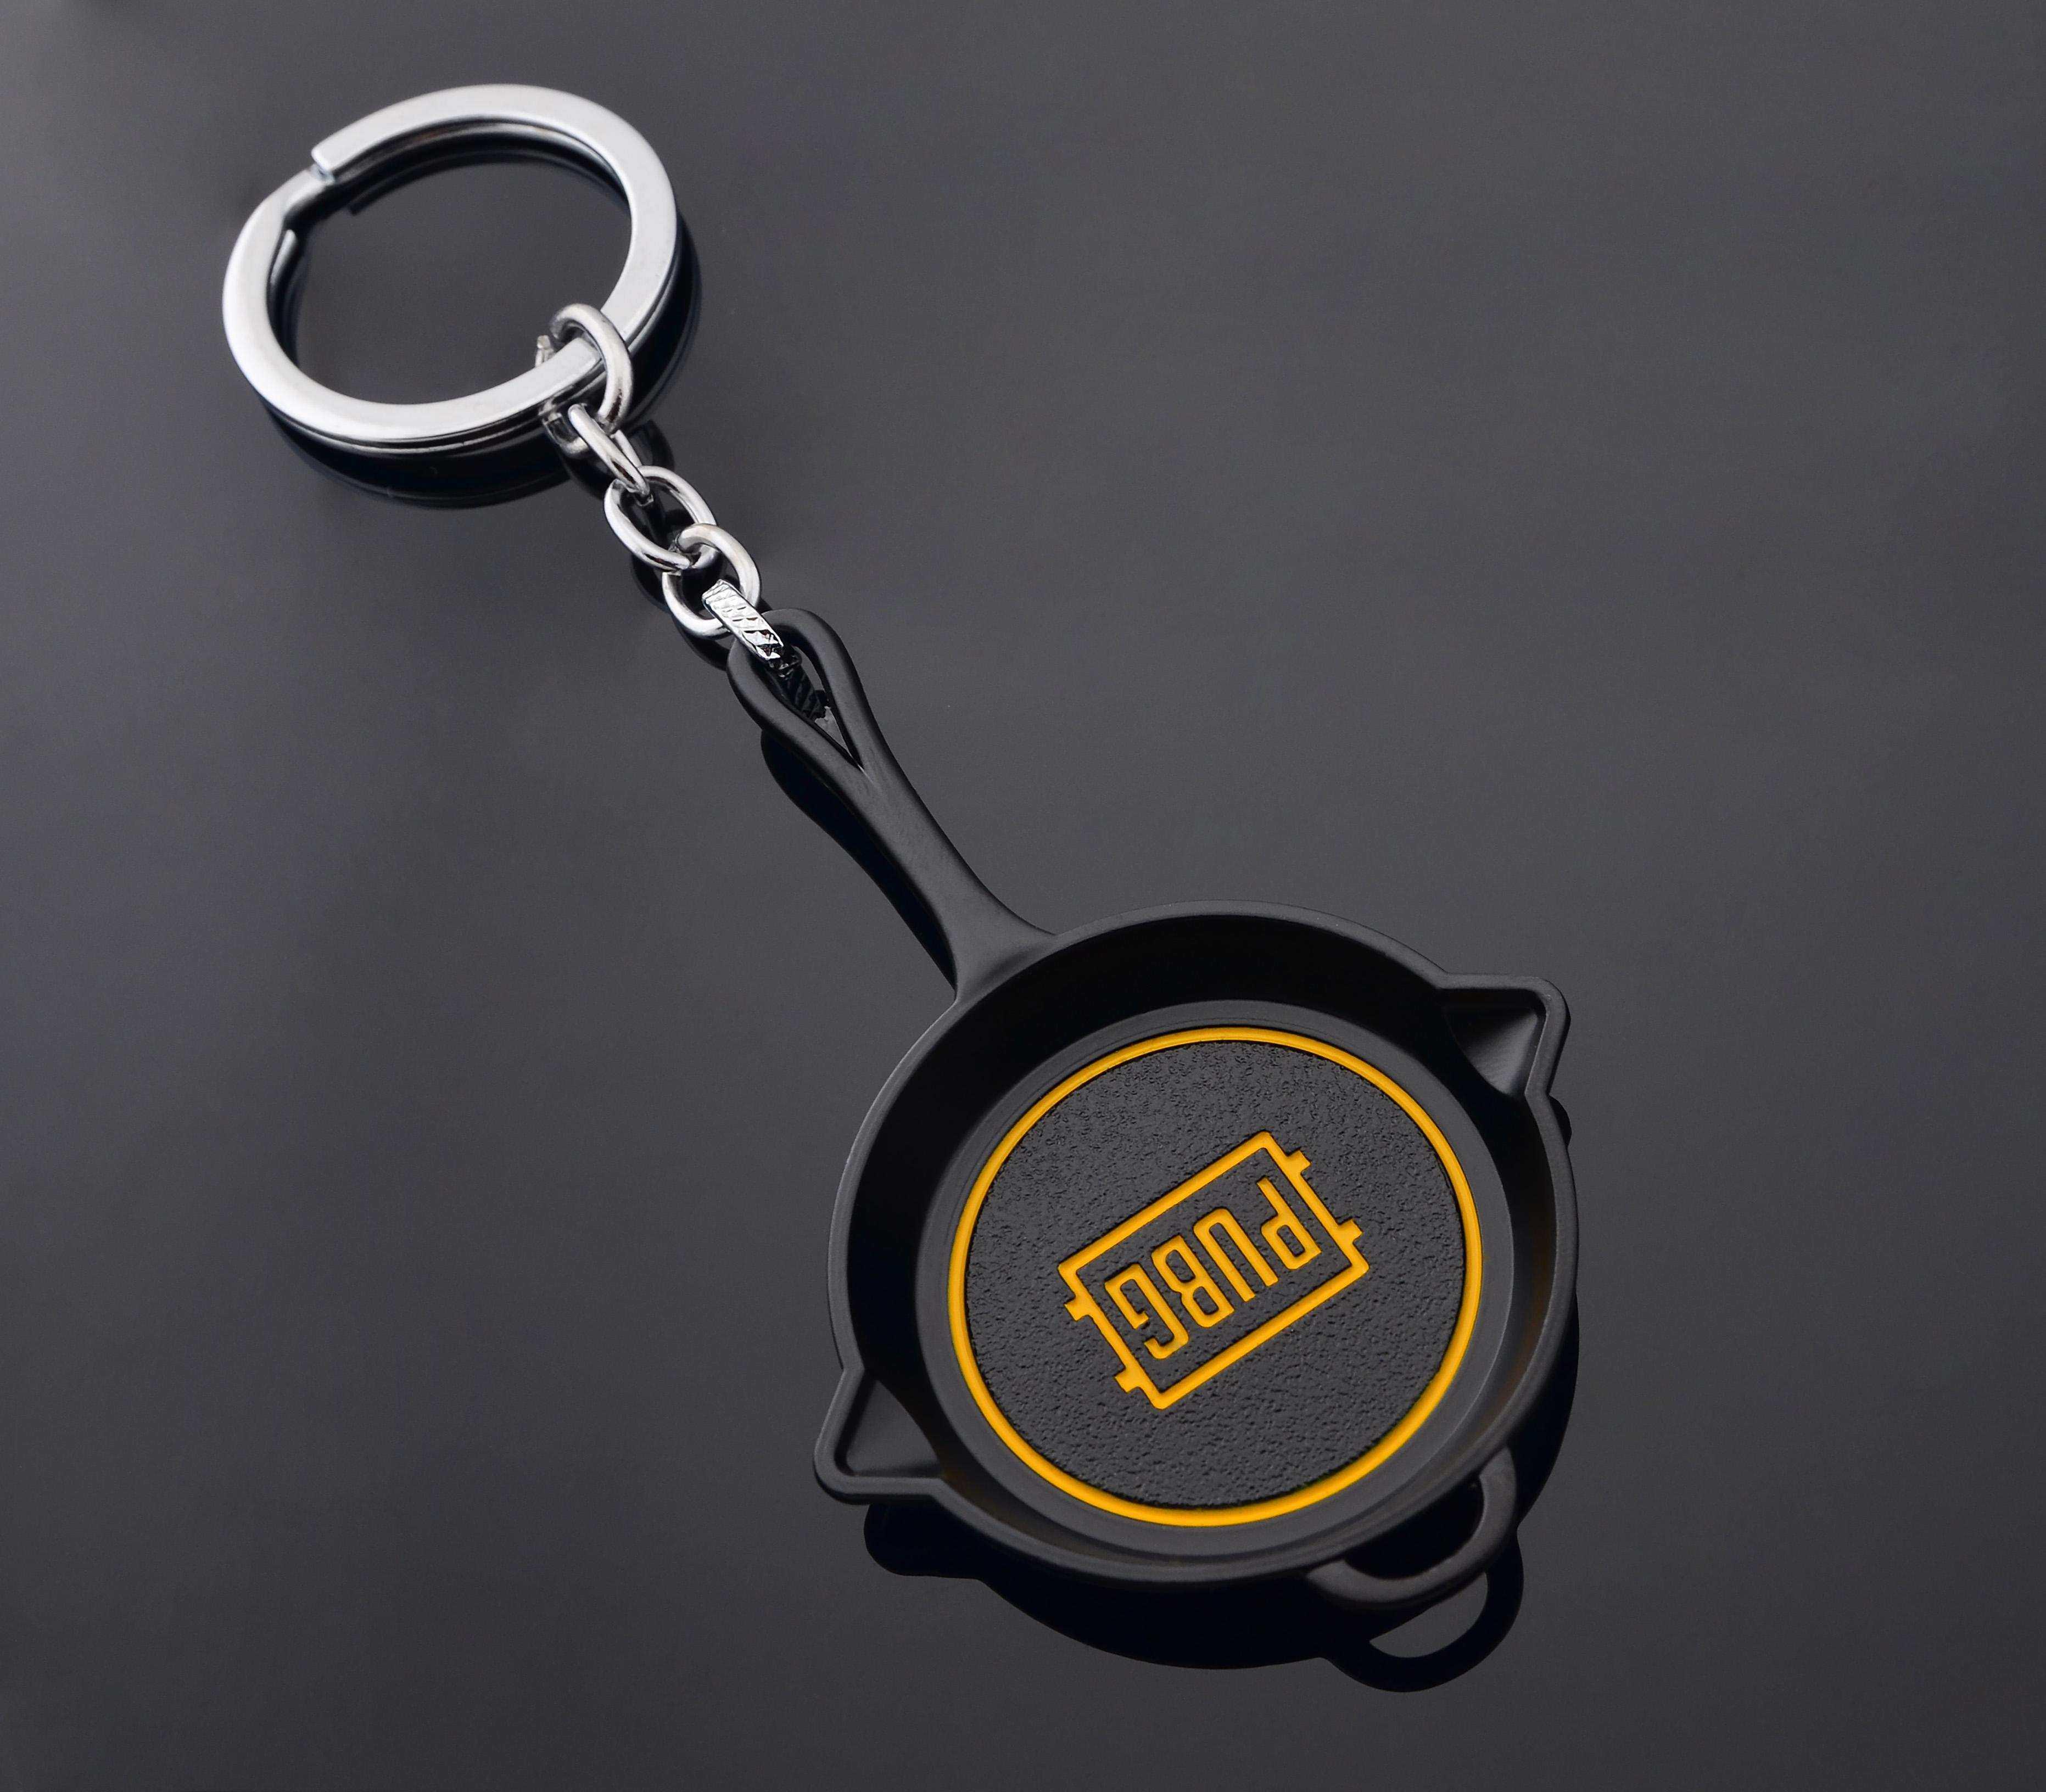 PUBG Tava Anahtarlık - ANA0053